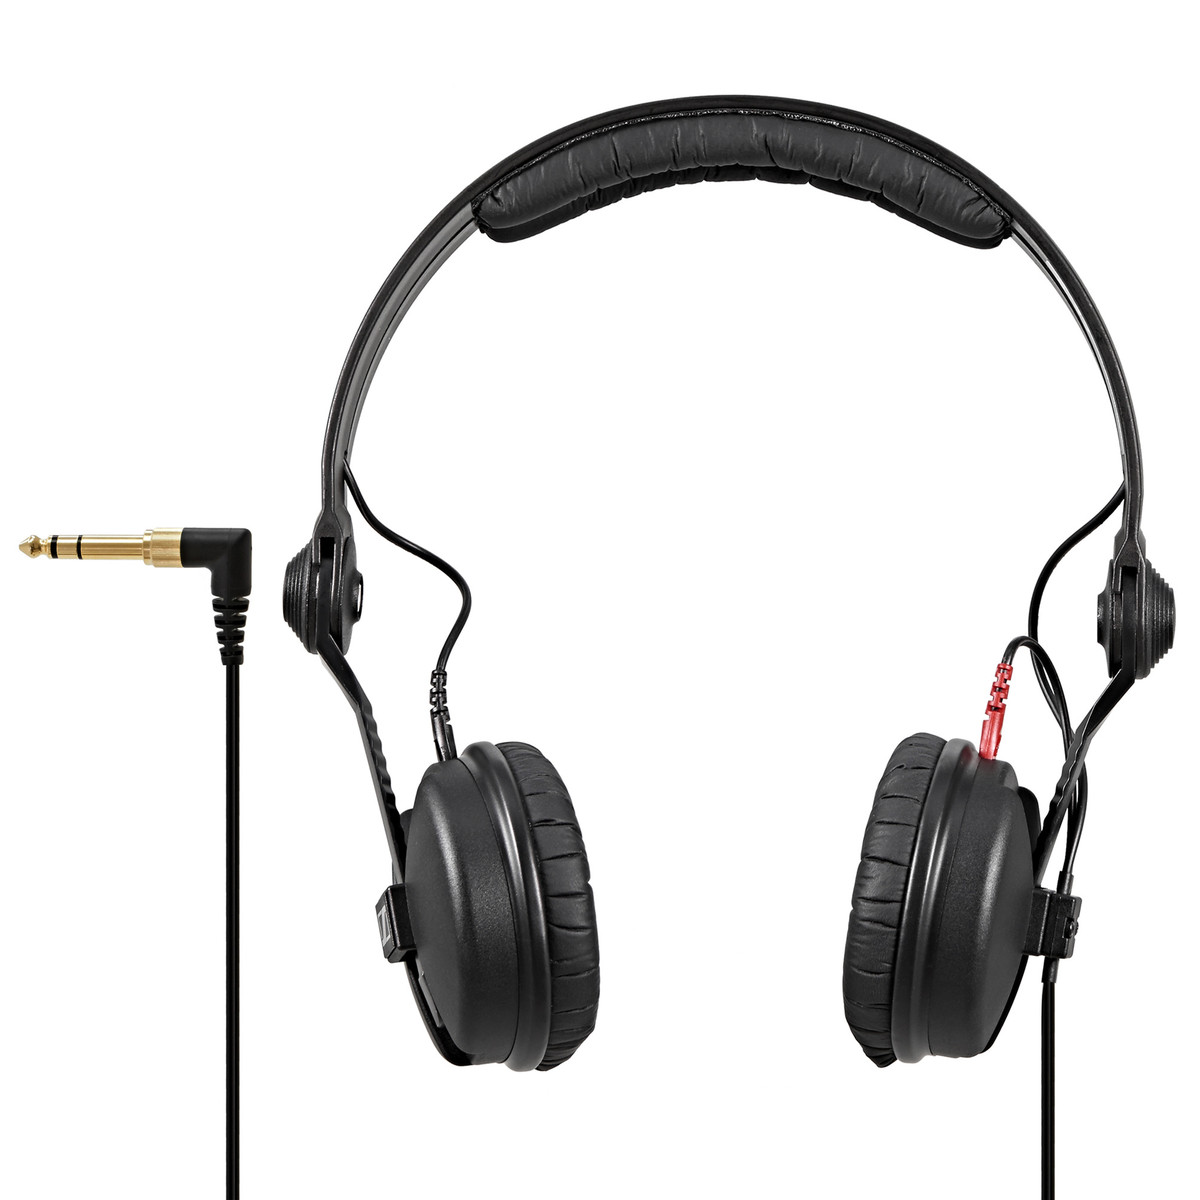 sennheiser hd 25 headphones b stock at gear4music. Black Bedroom Furniture Sets. Home Design Ideas